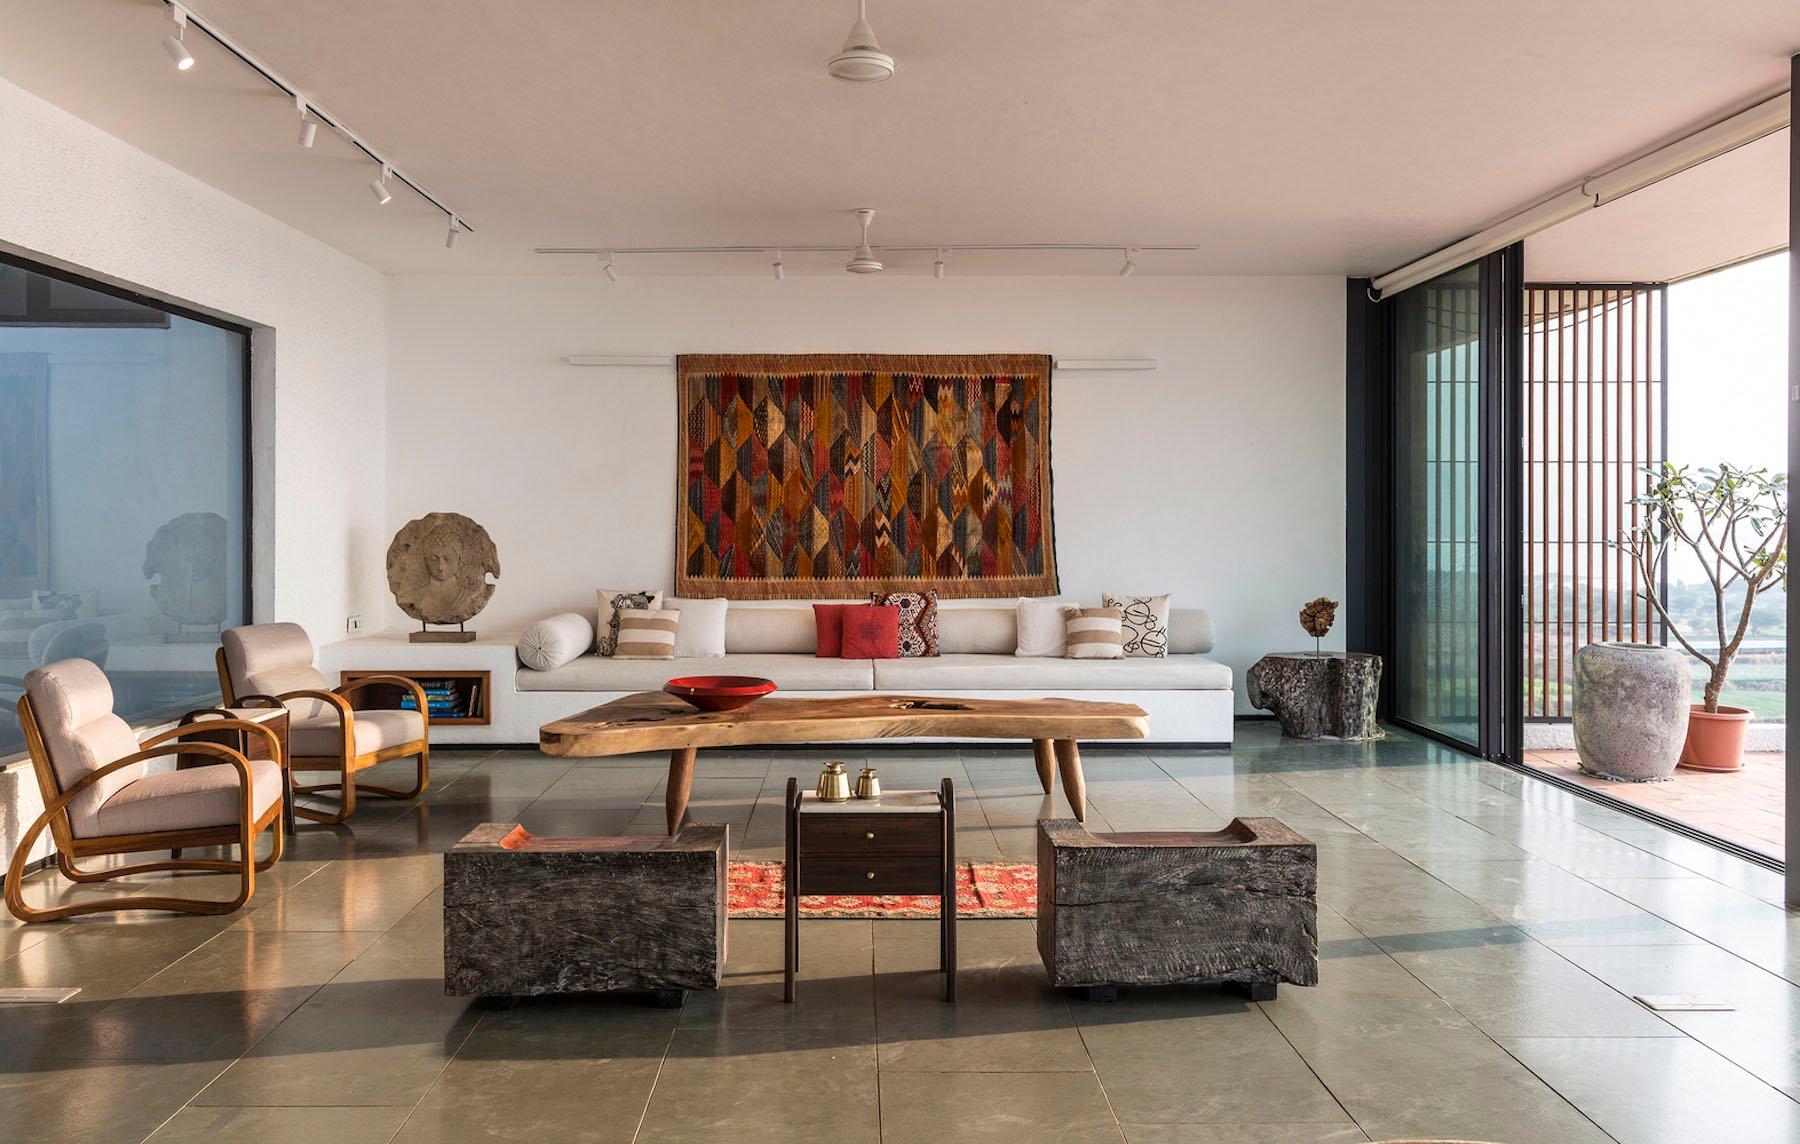 iGNANT-Architecture-Spasm-Design-The-Soaring-Rock-06